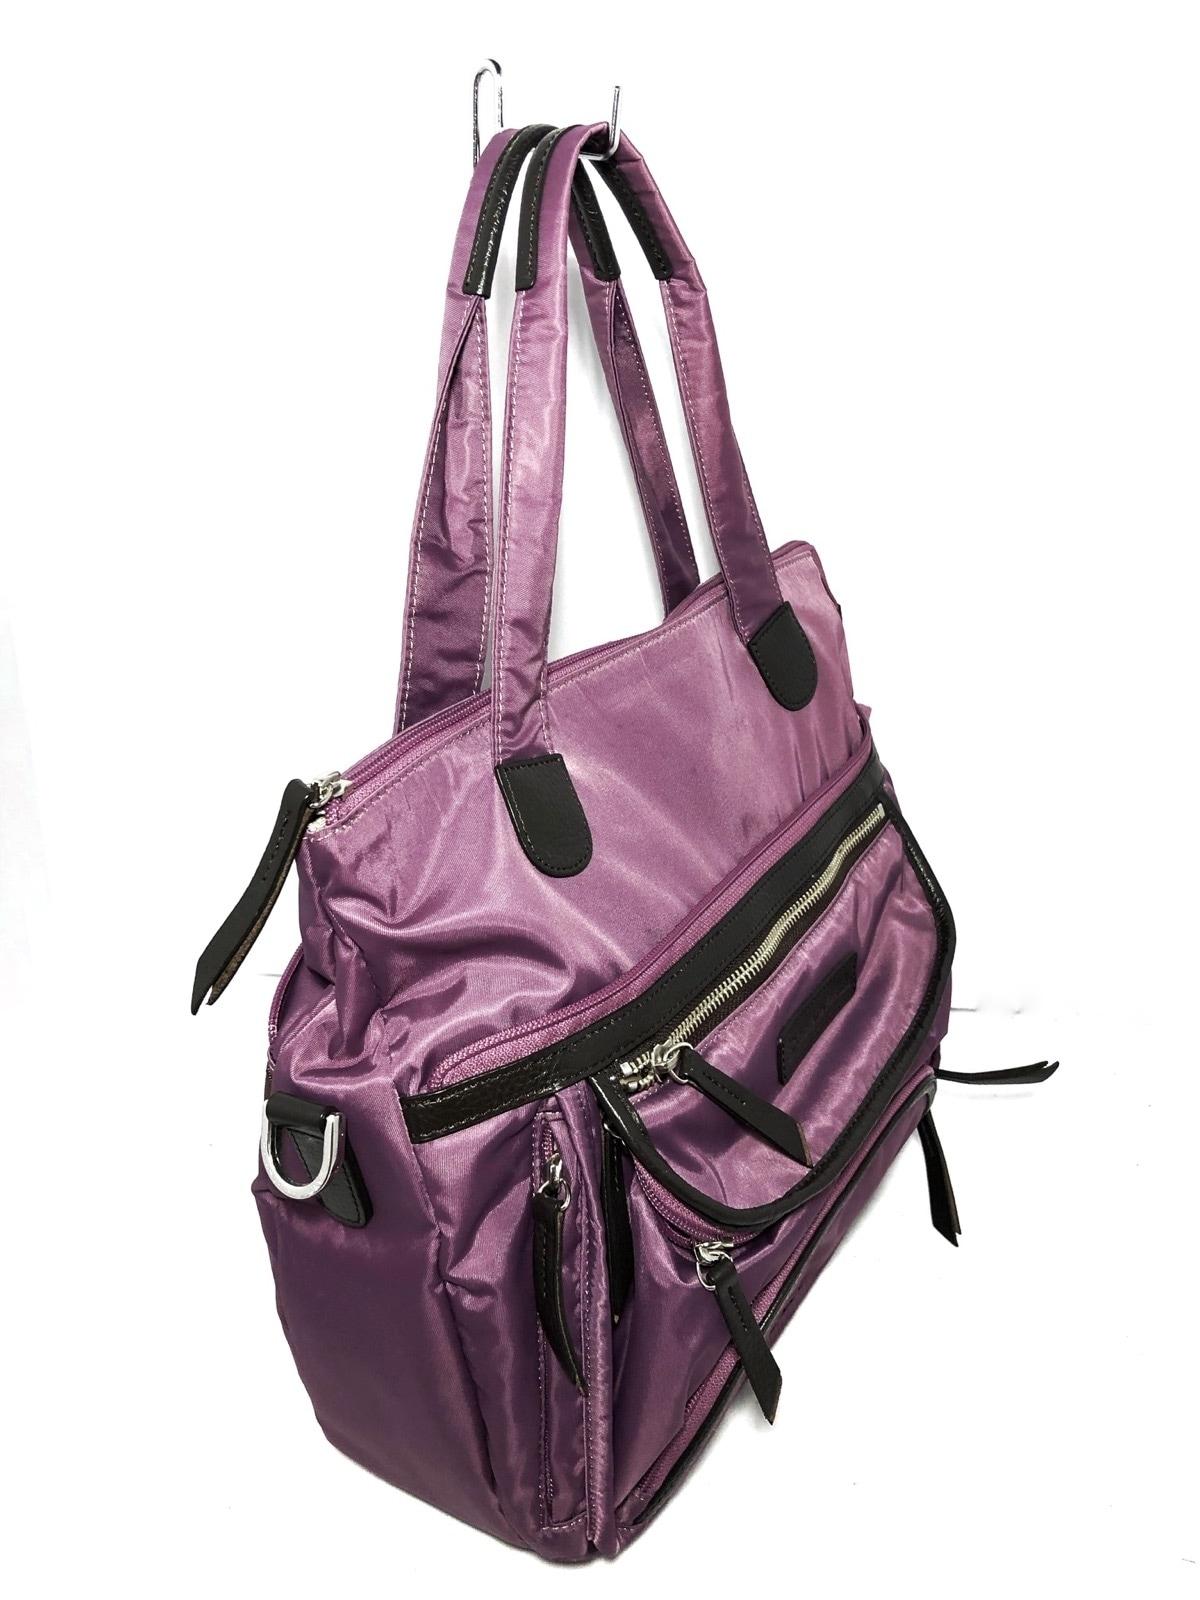 CASTELLO da vinci(カステロ ダ ヴィンチ)のハンドバッグ